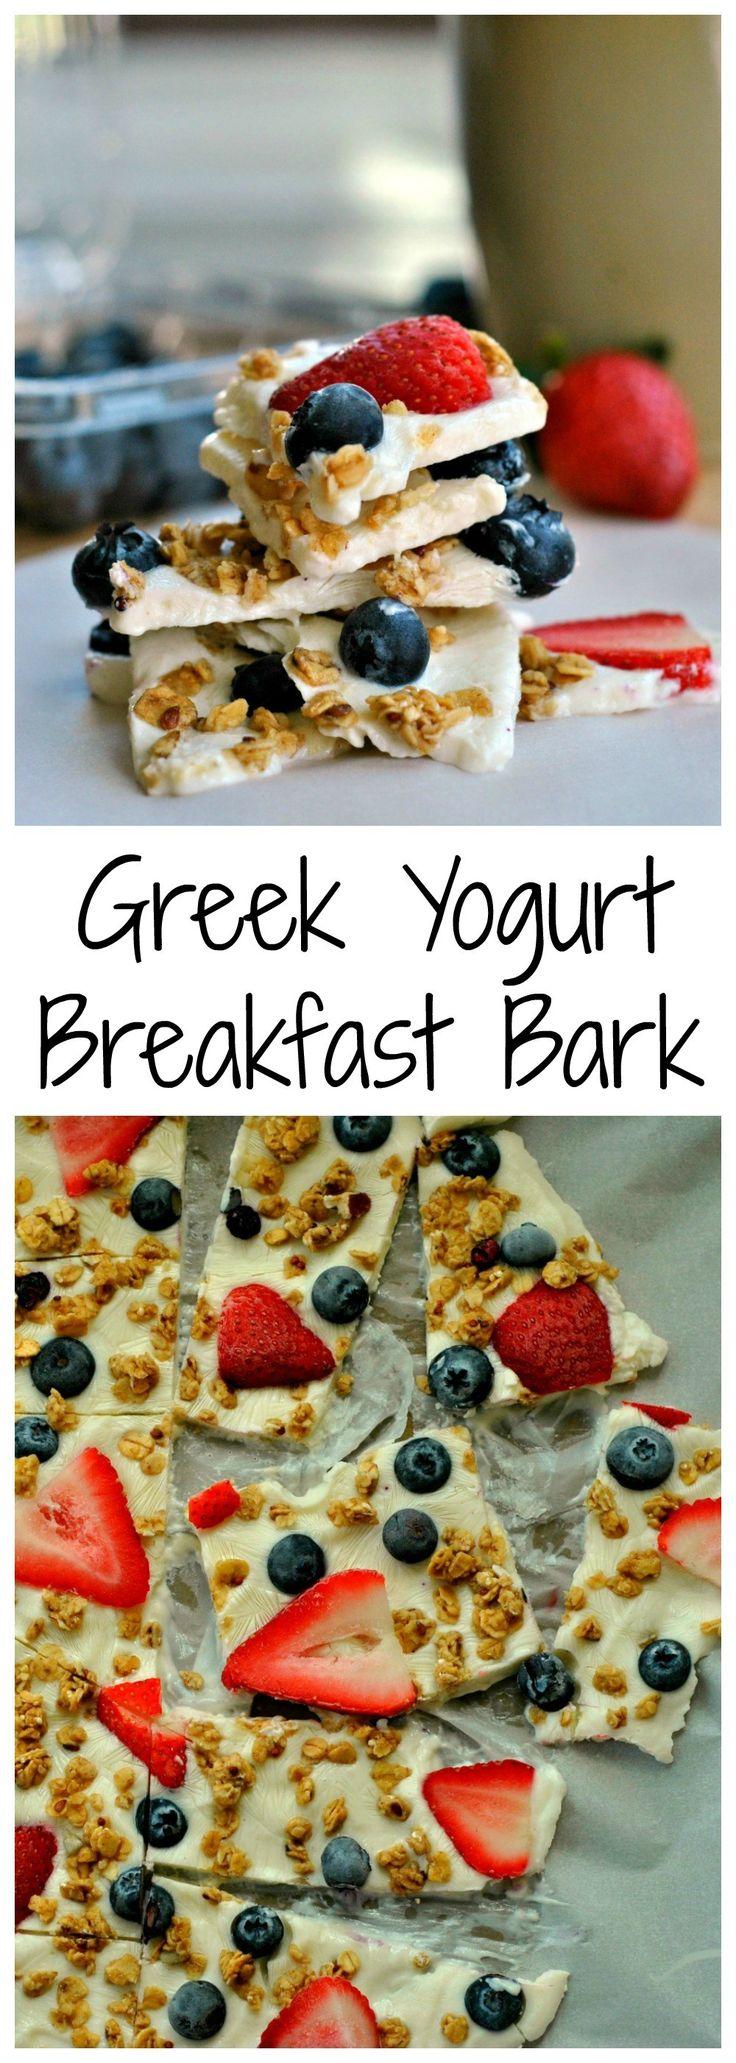 Classroom Breakfast Ideas ~ Best ideas about class snacks on pinterest